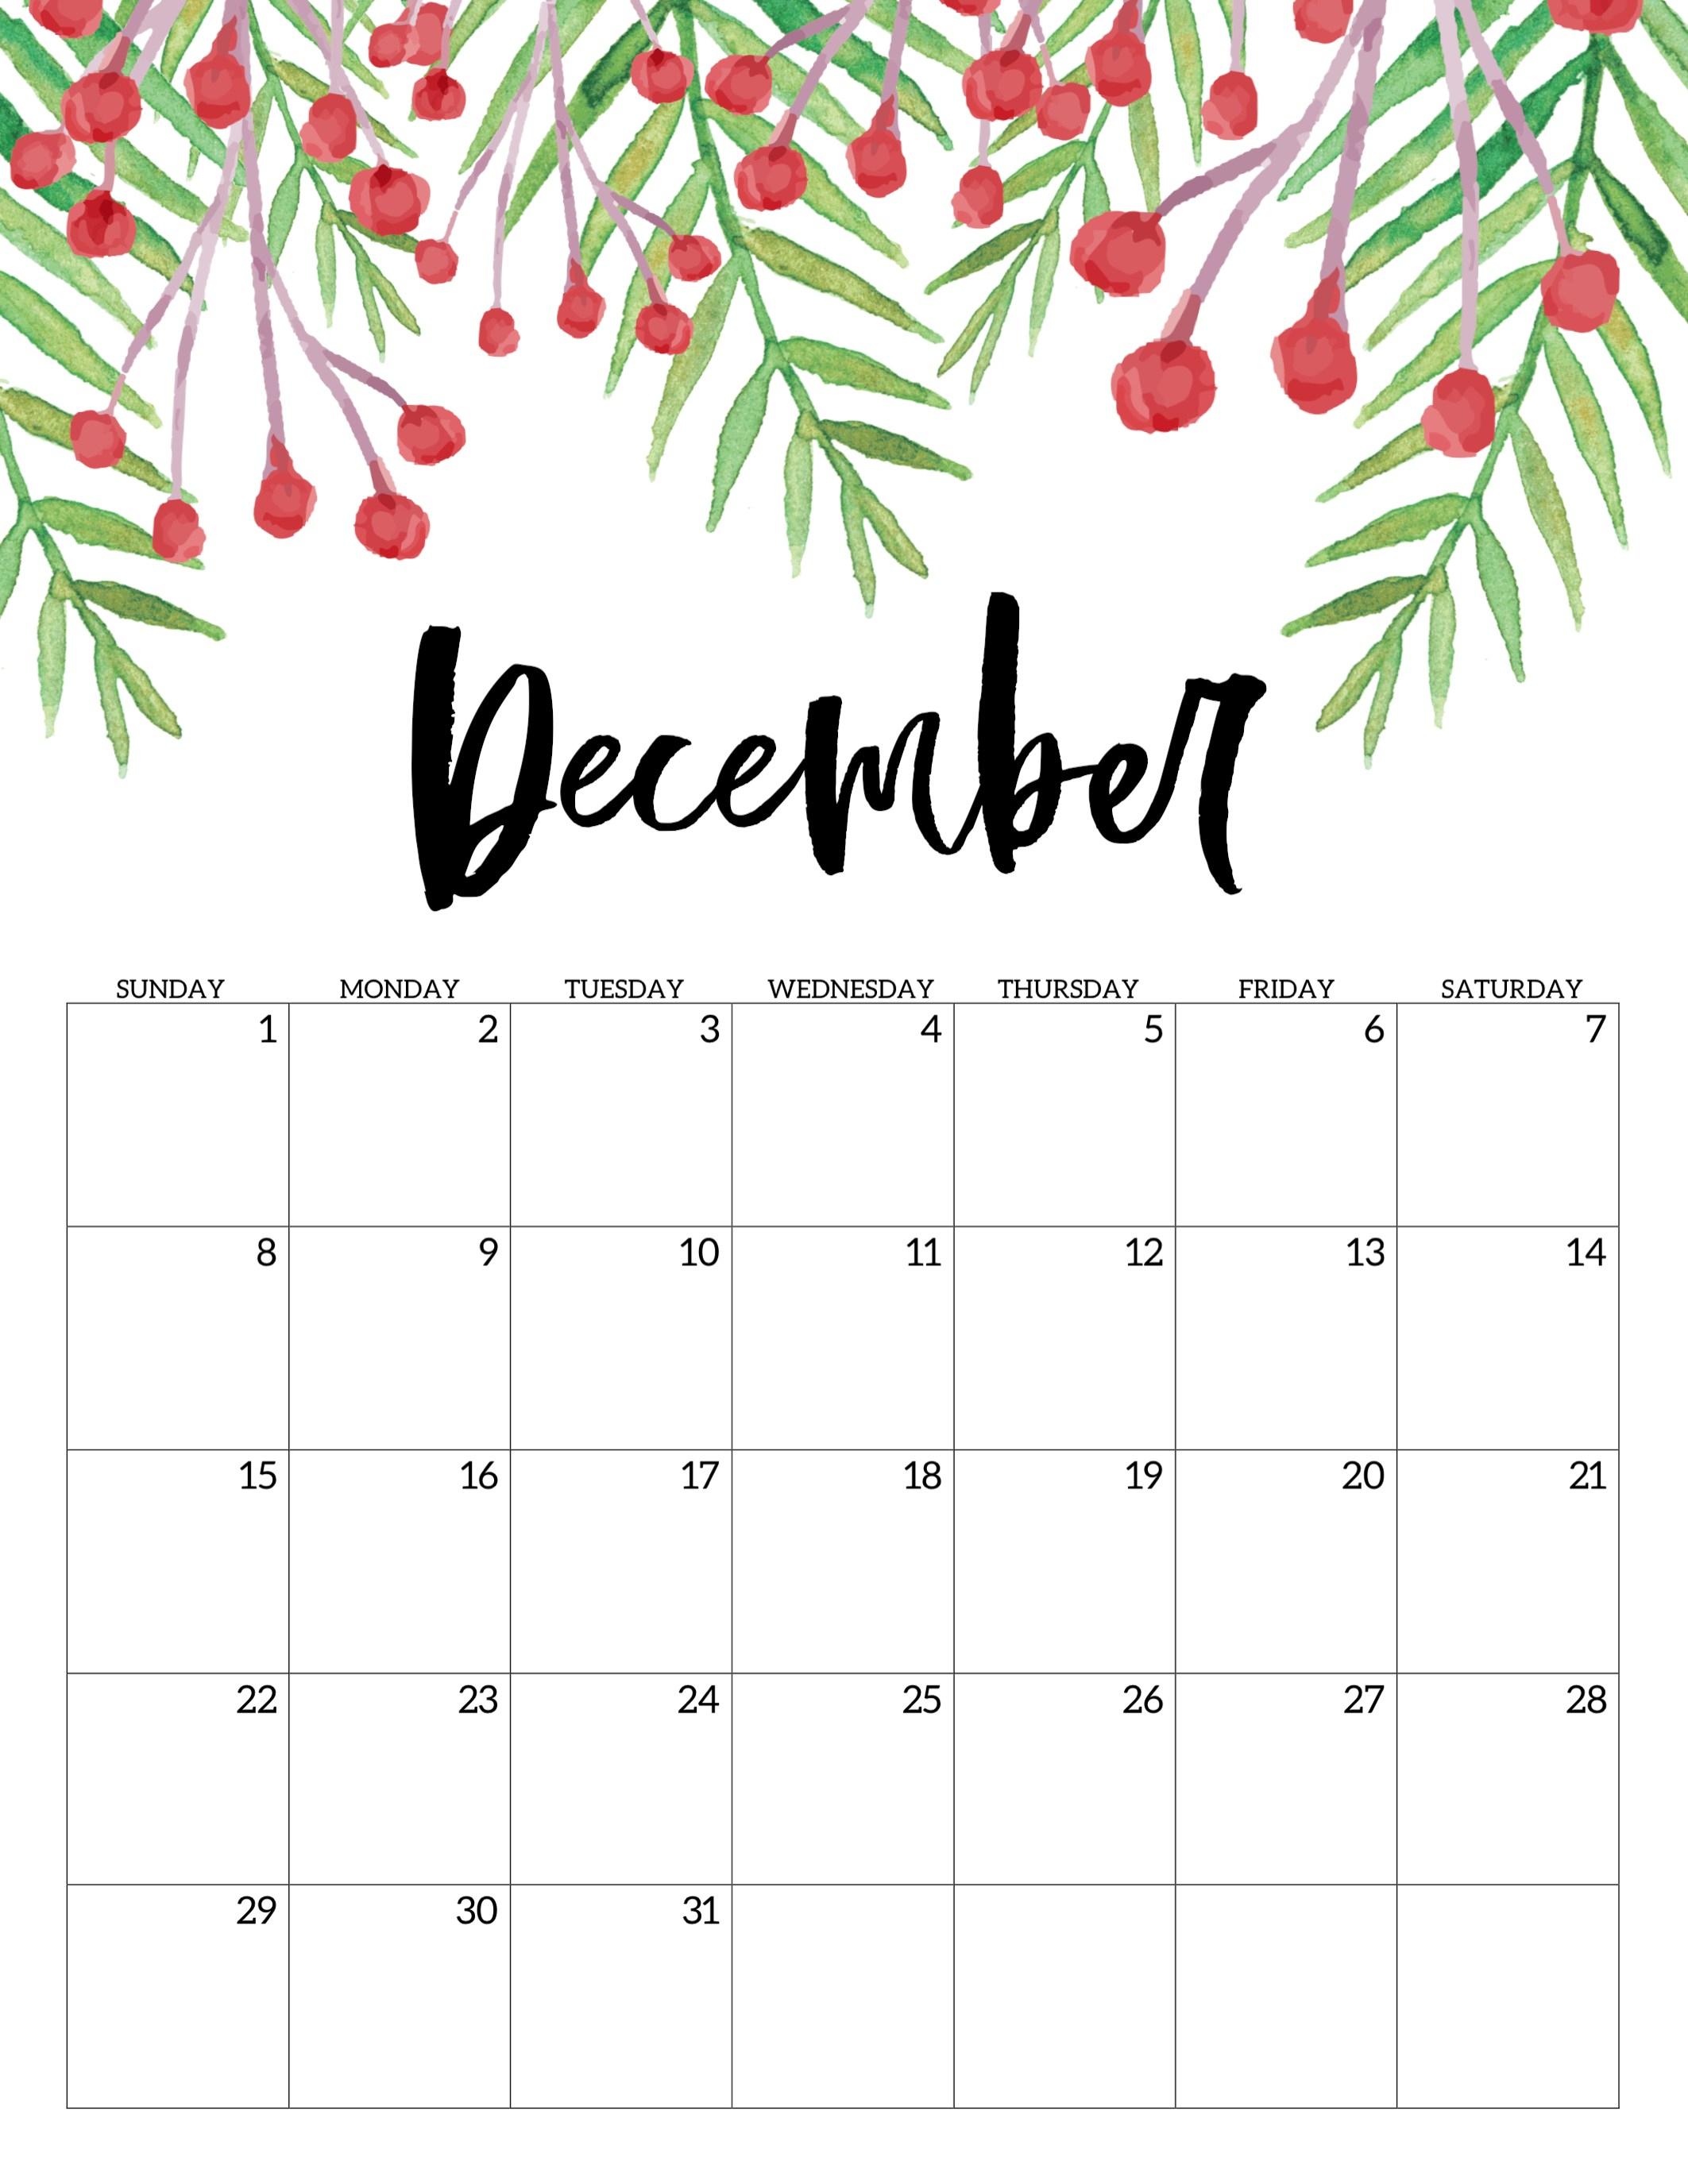 Free Printable Calendar 2019 - Floral - Paper Trail Design with Decorative Printable Calendar Templates